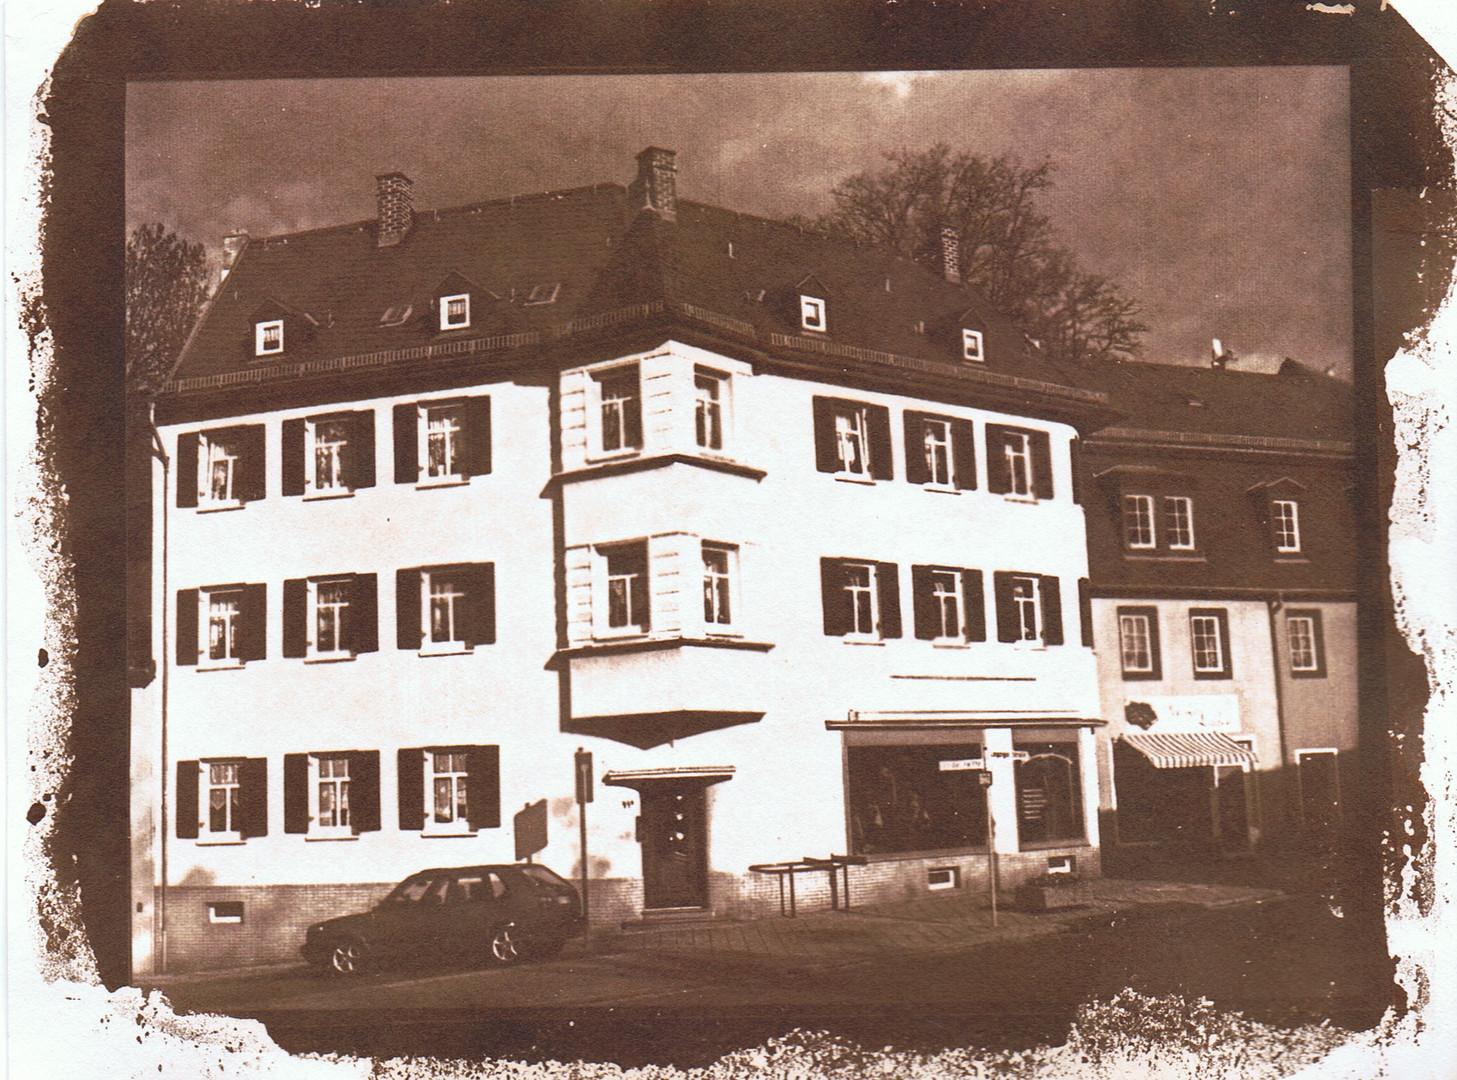 Taucha/ Sa., Eckhaus Leipziger Straße